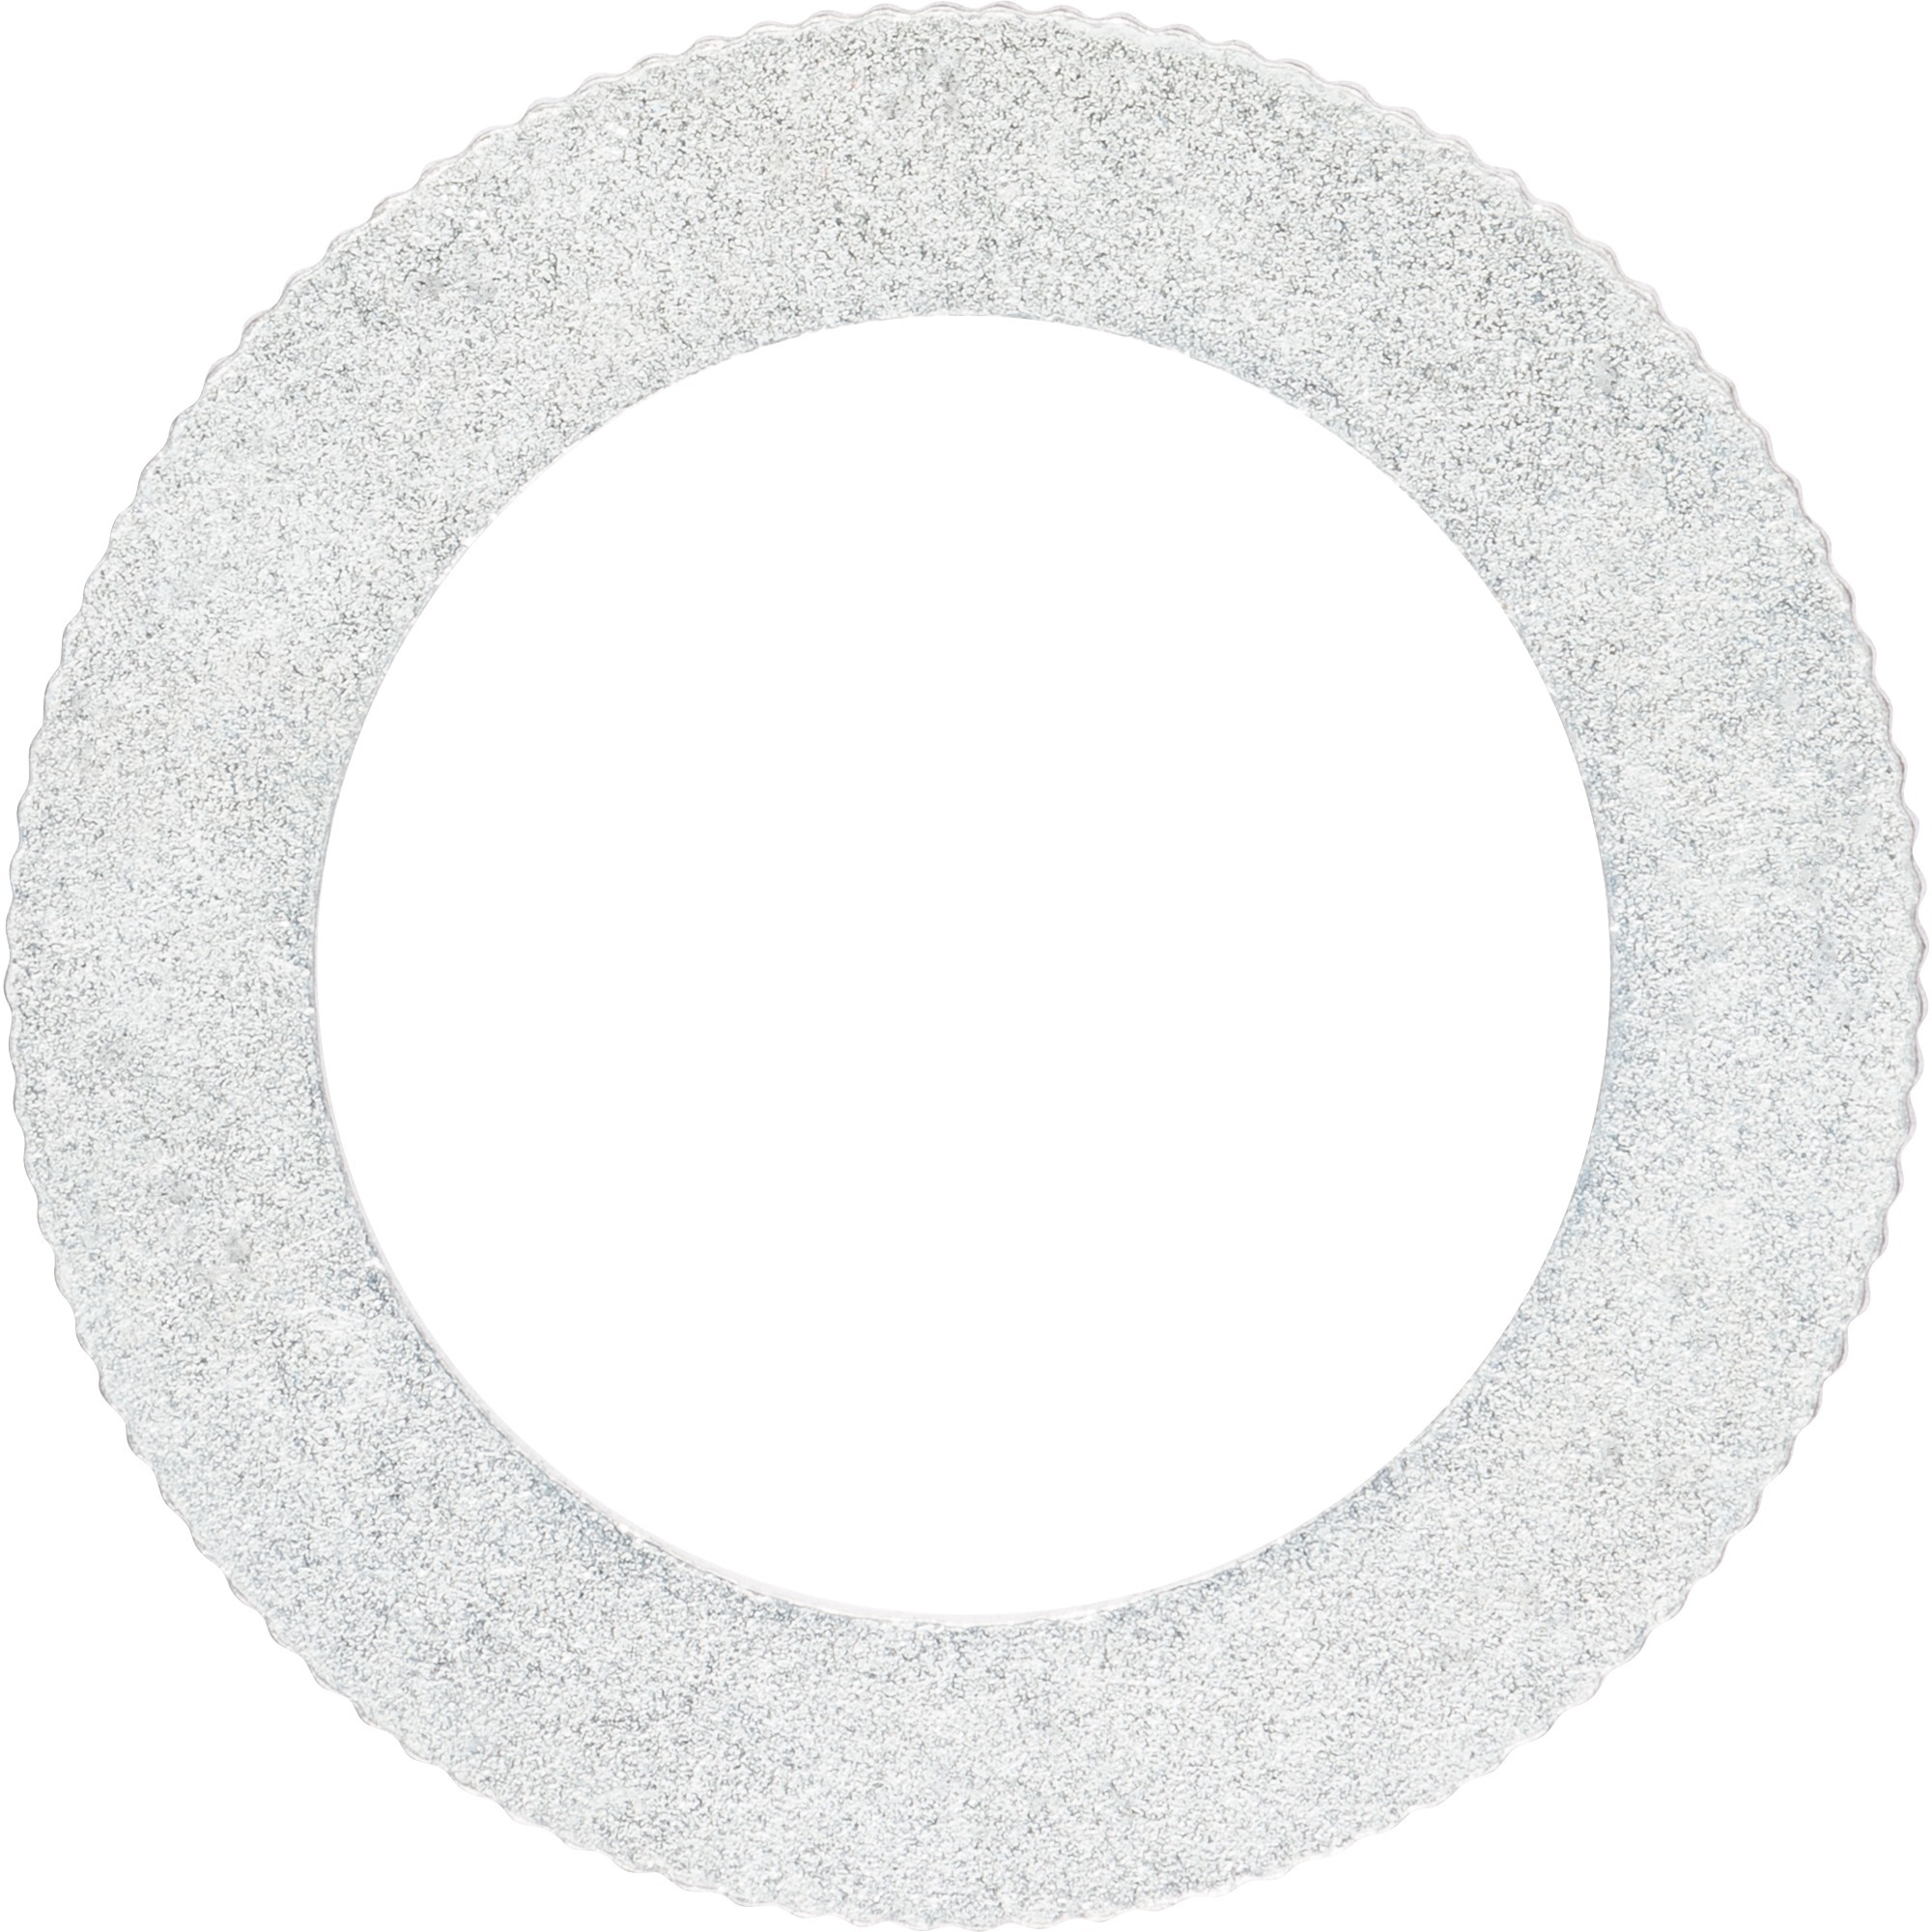 2 600 100 208 accesorio de sierras circulares, Adaptador